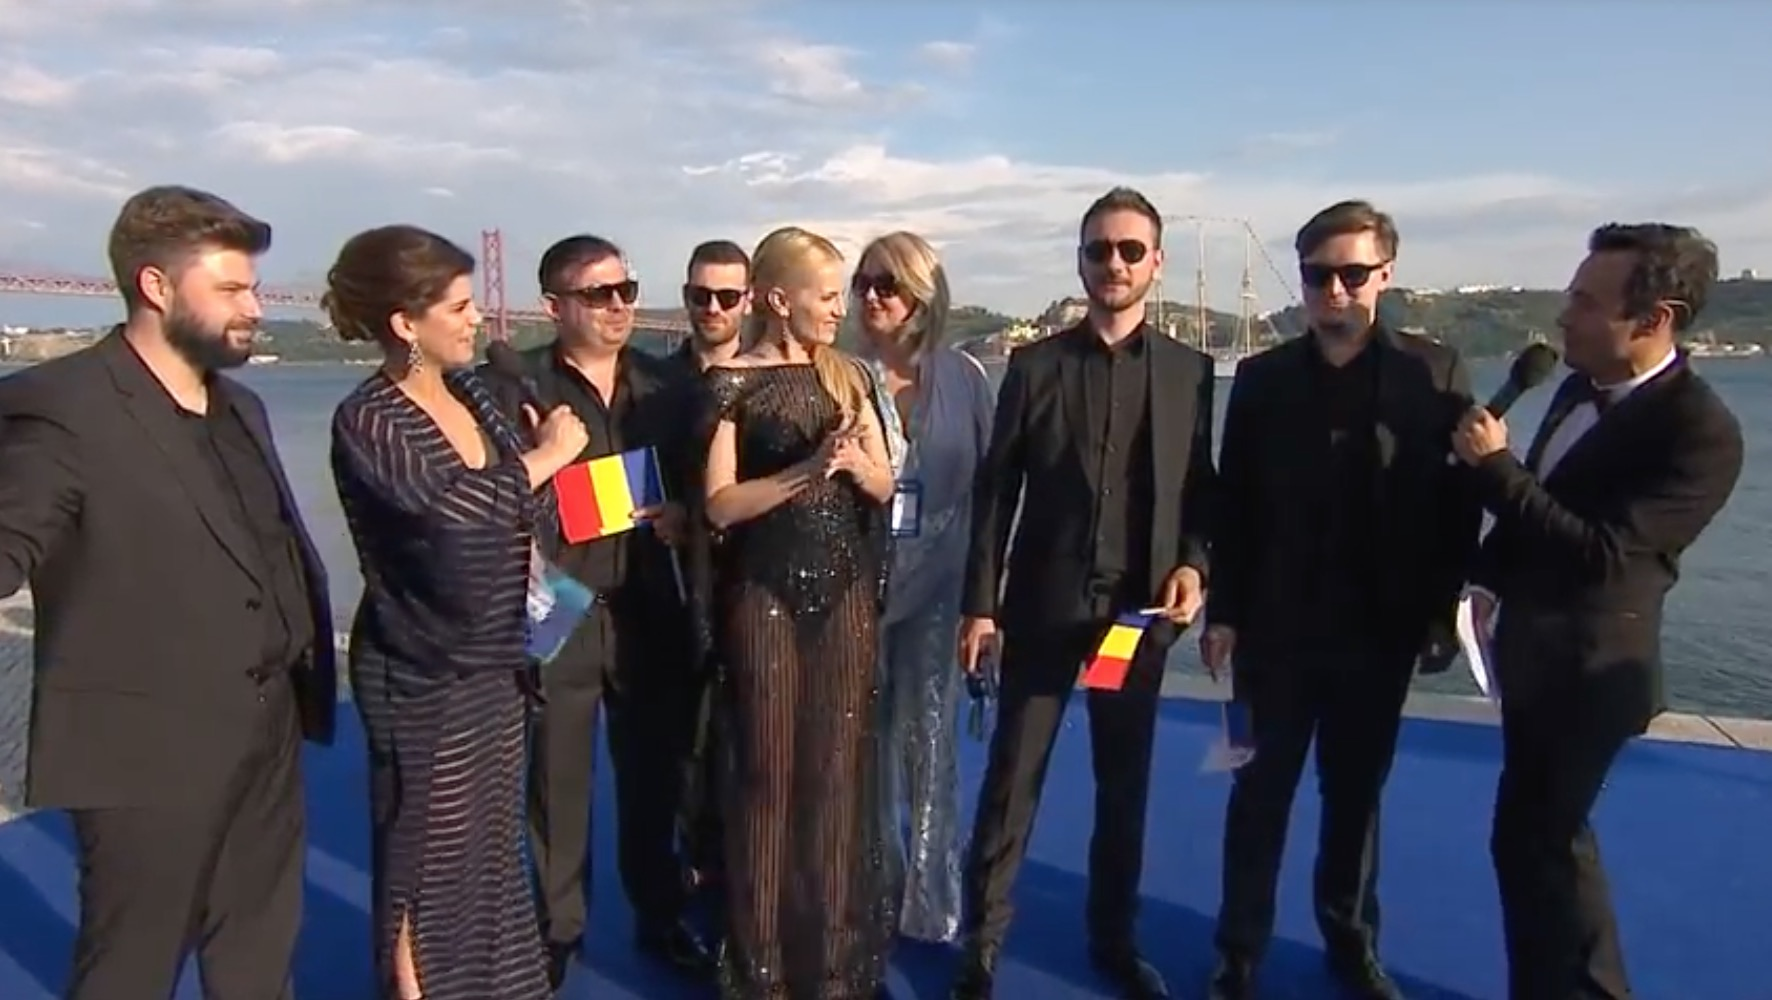 Eurovision 2018 - Ziua 1 - EXCLUSIV! Spania, Moldova, Norvegia mesaje speciale pentru România!